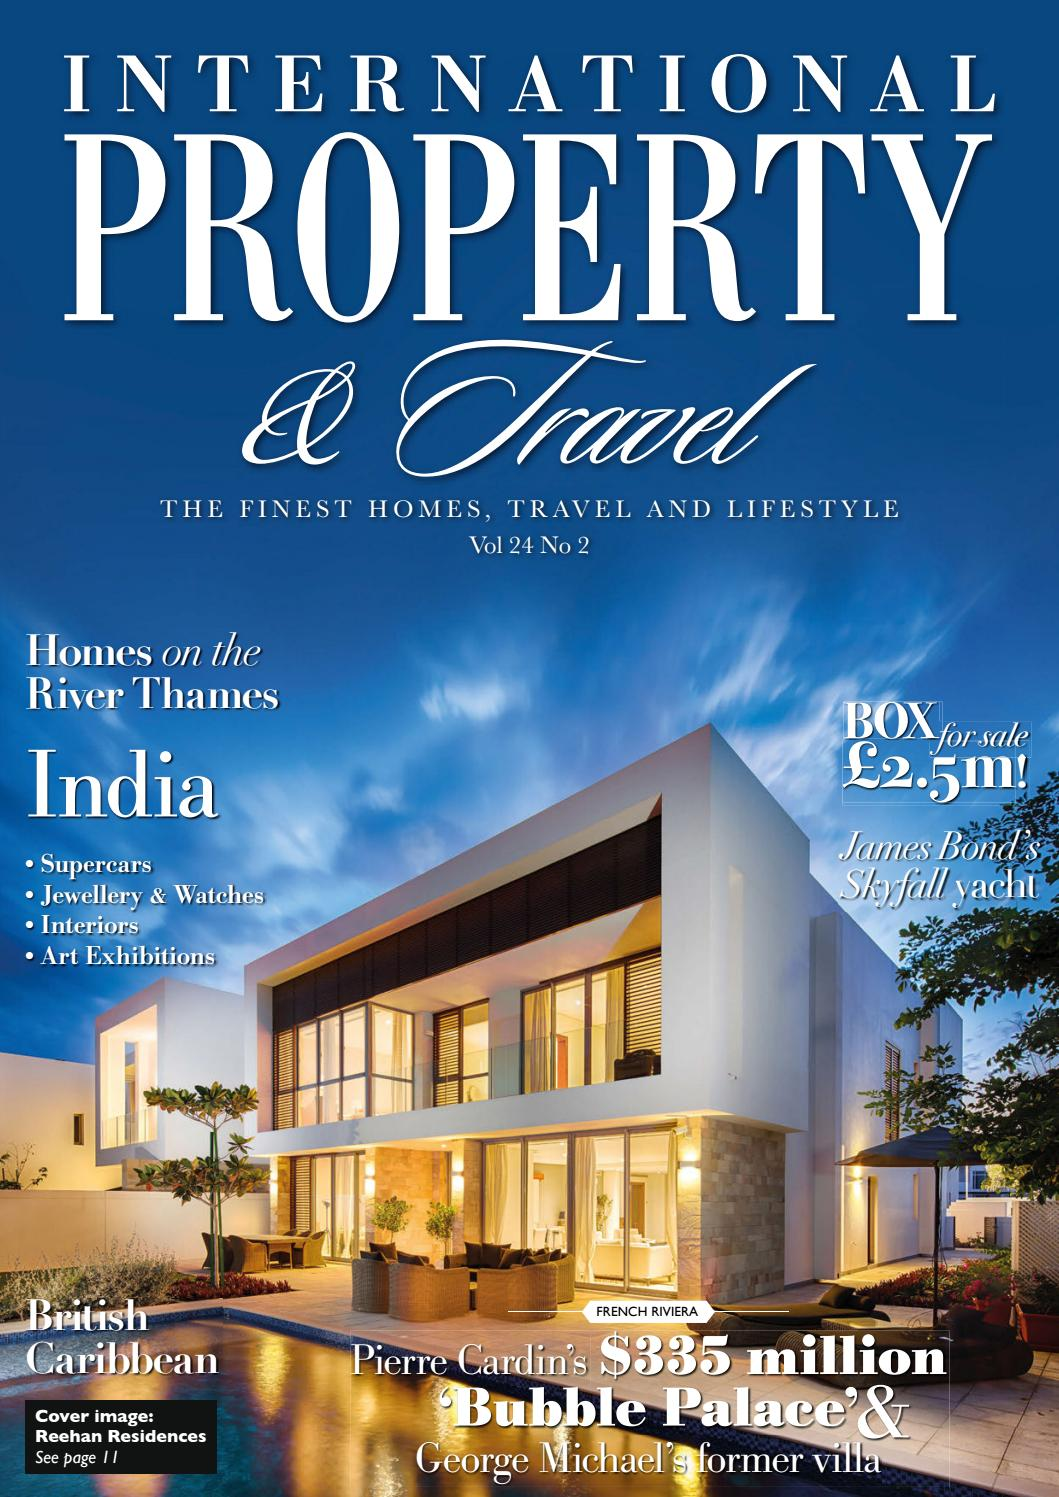 International property magazine - International Property Travel Volume 24 Number 2